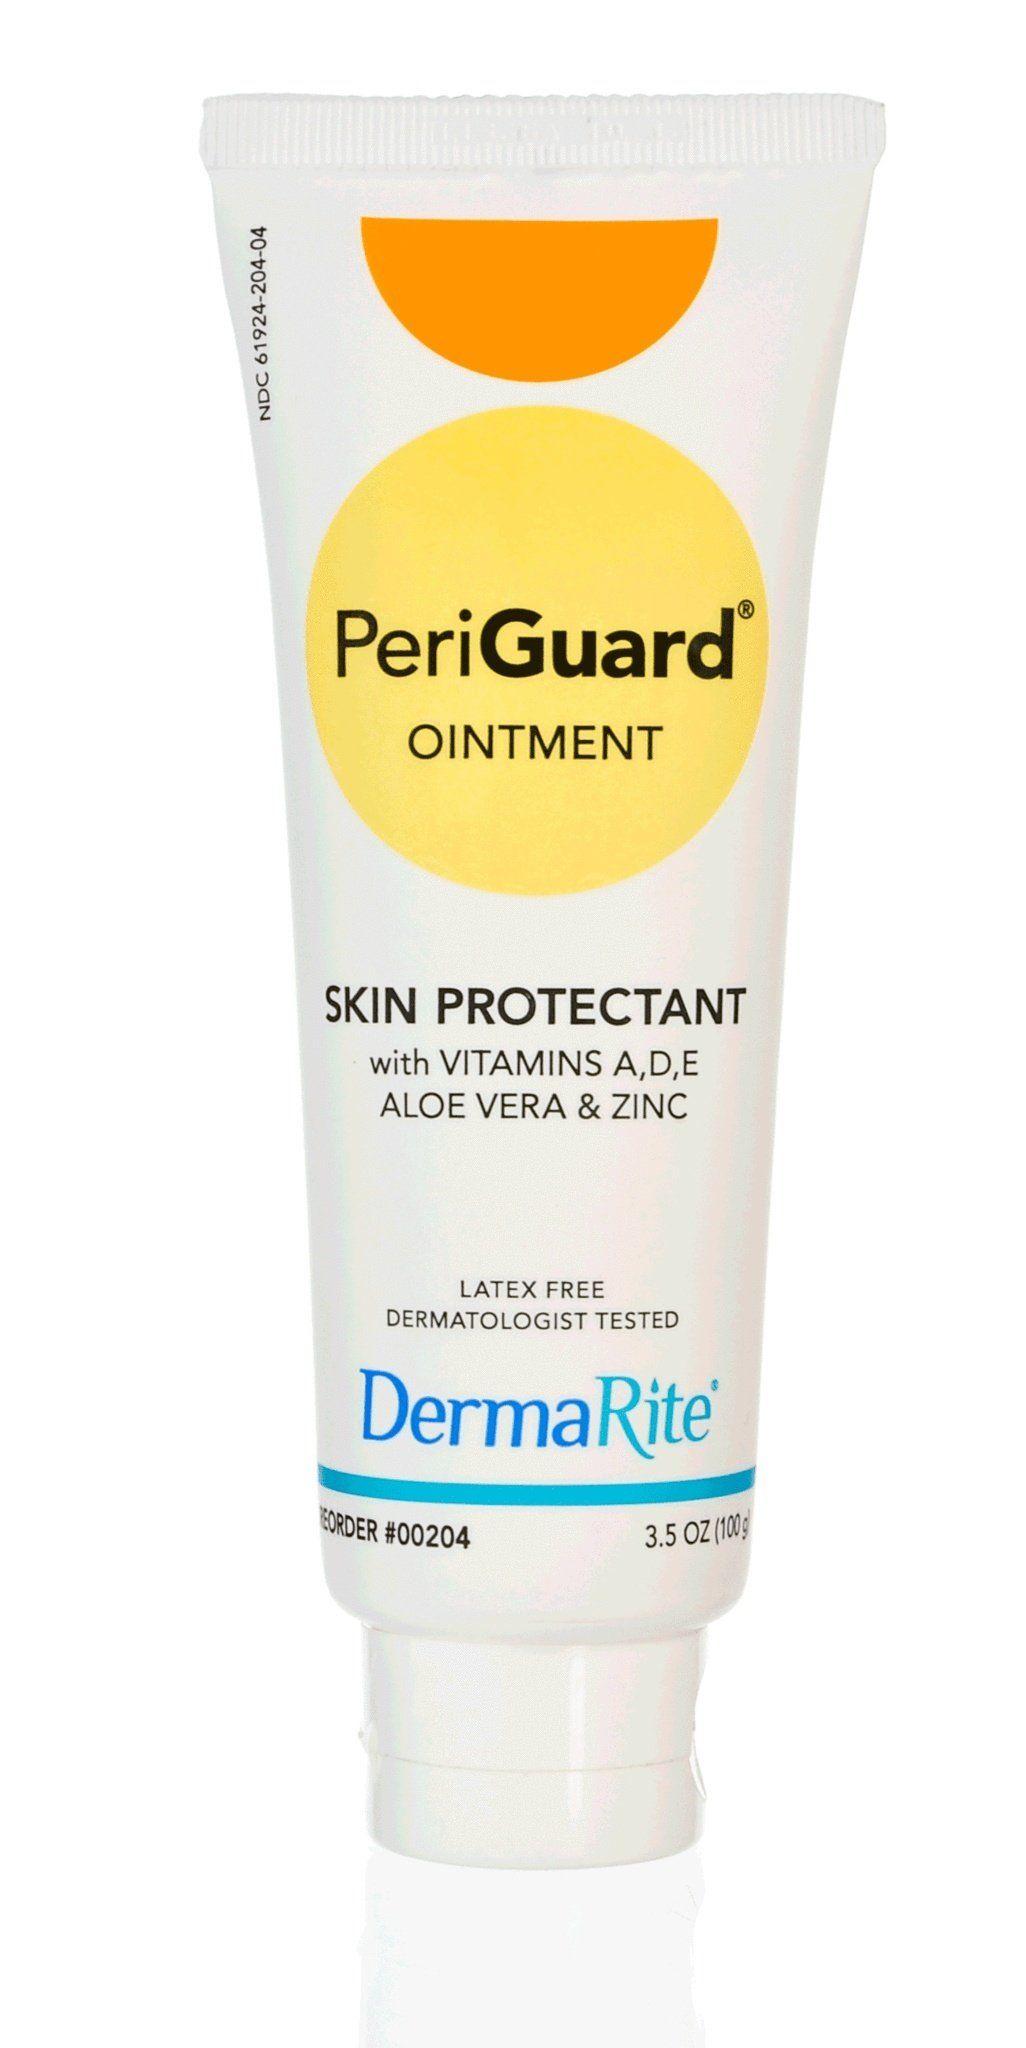 Dermarite 00204 periguard skin protectant 35 oz tube